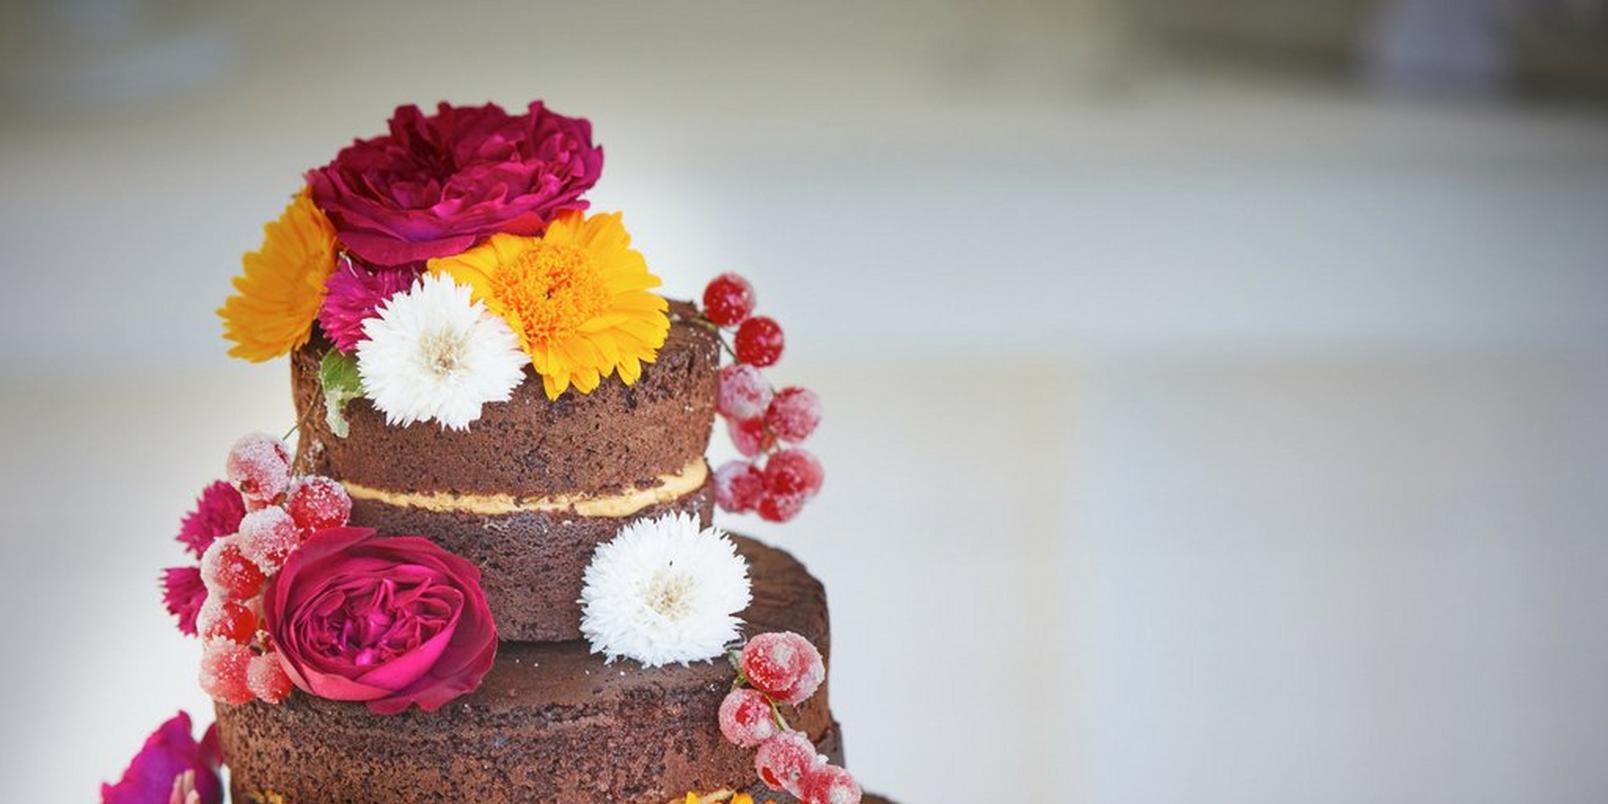 naked-chocolate-wedding-cake-edible-flowers-fruit